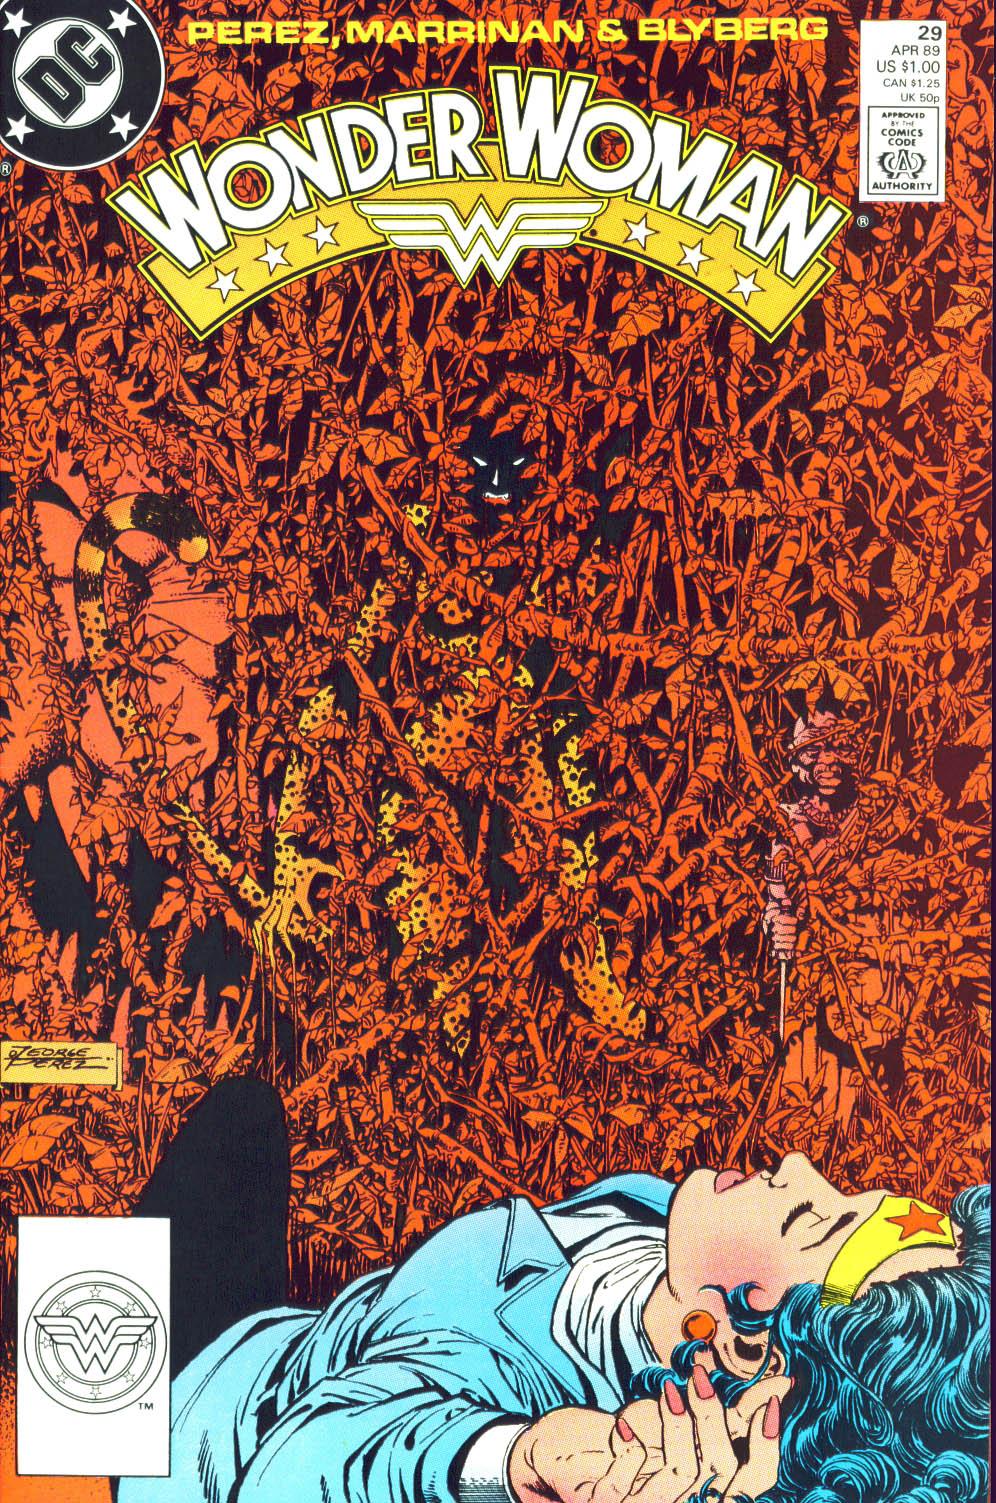 Read online Wonder Woman (1987) comic -  Issue #29 - 2